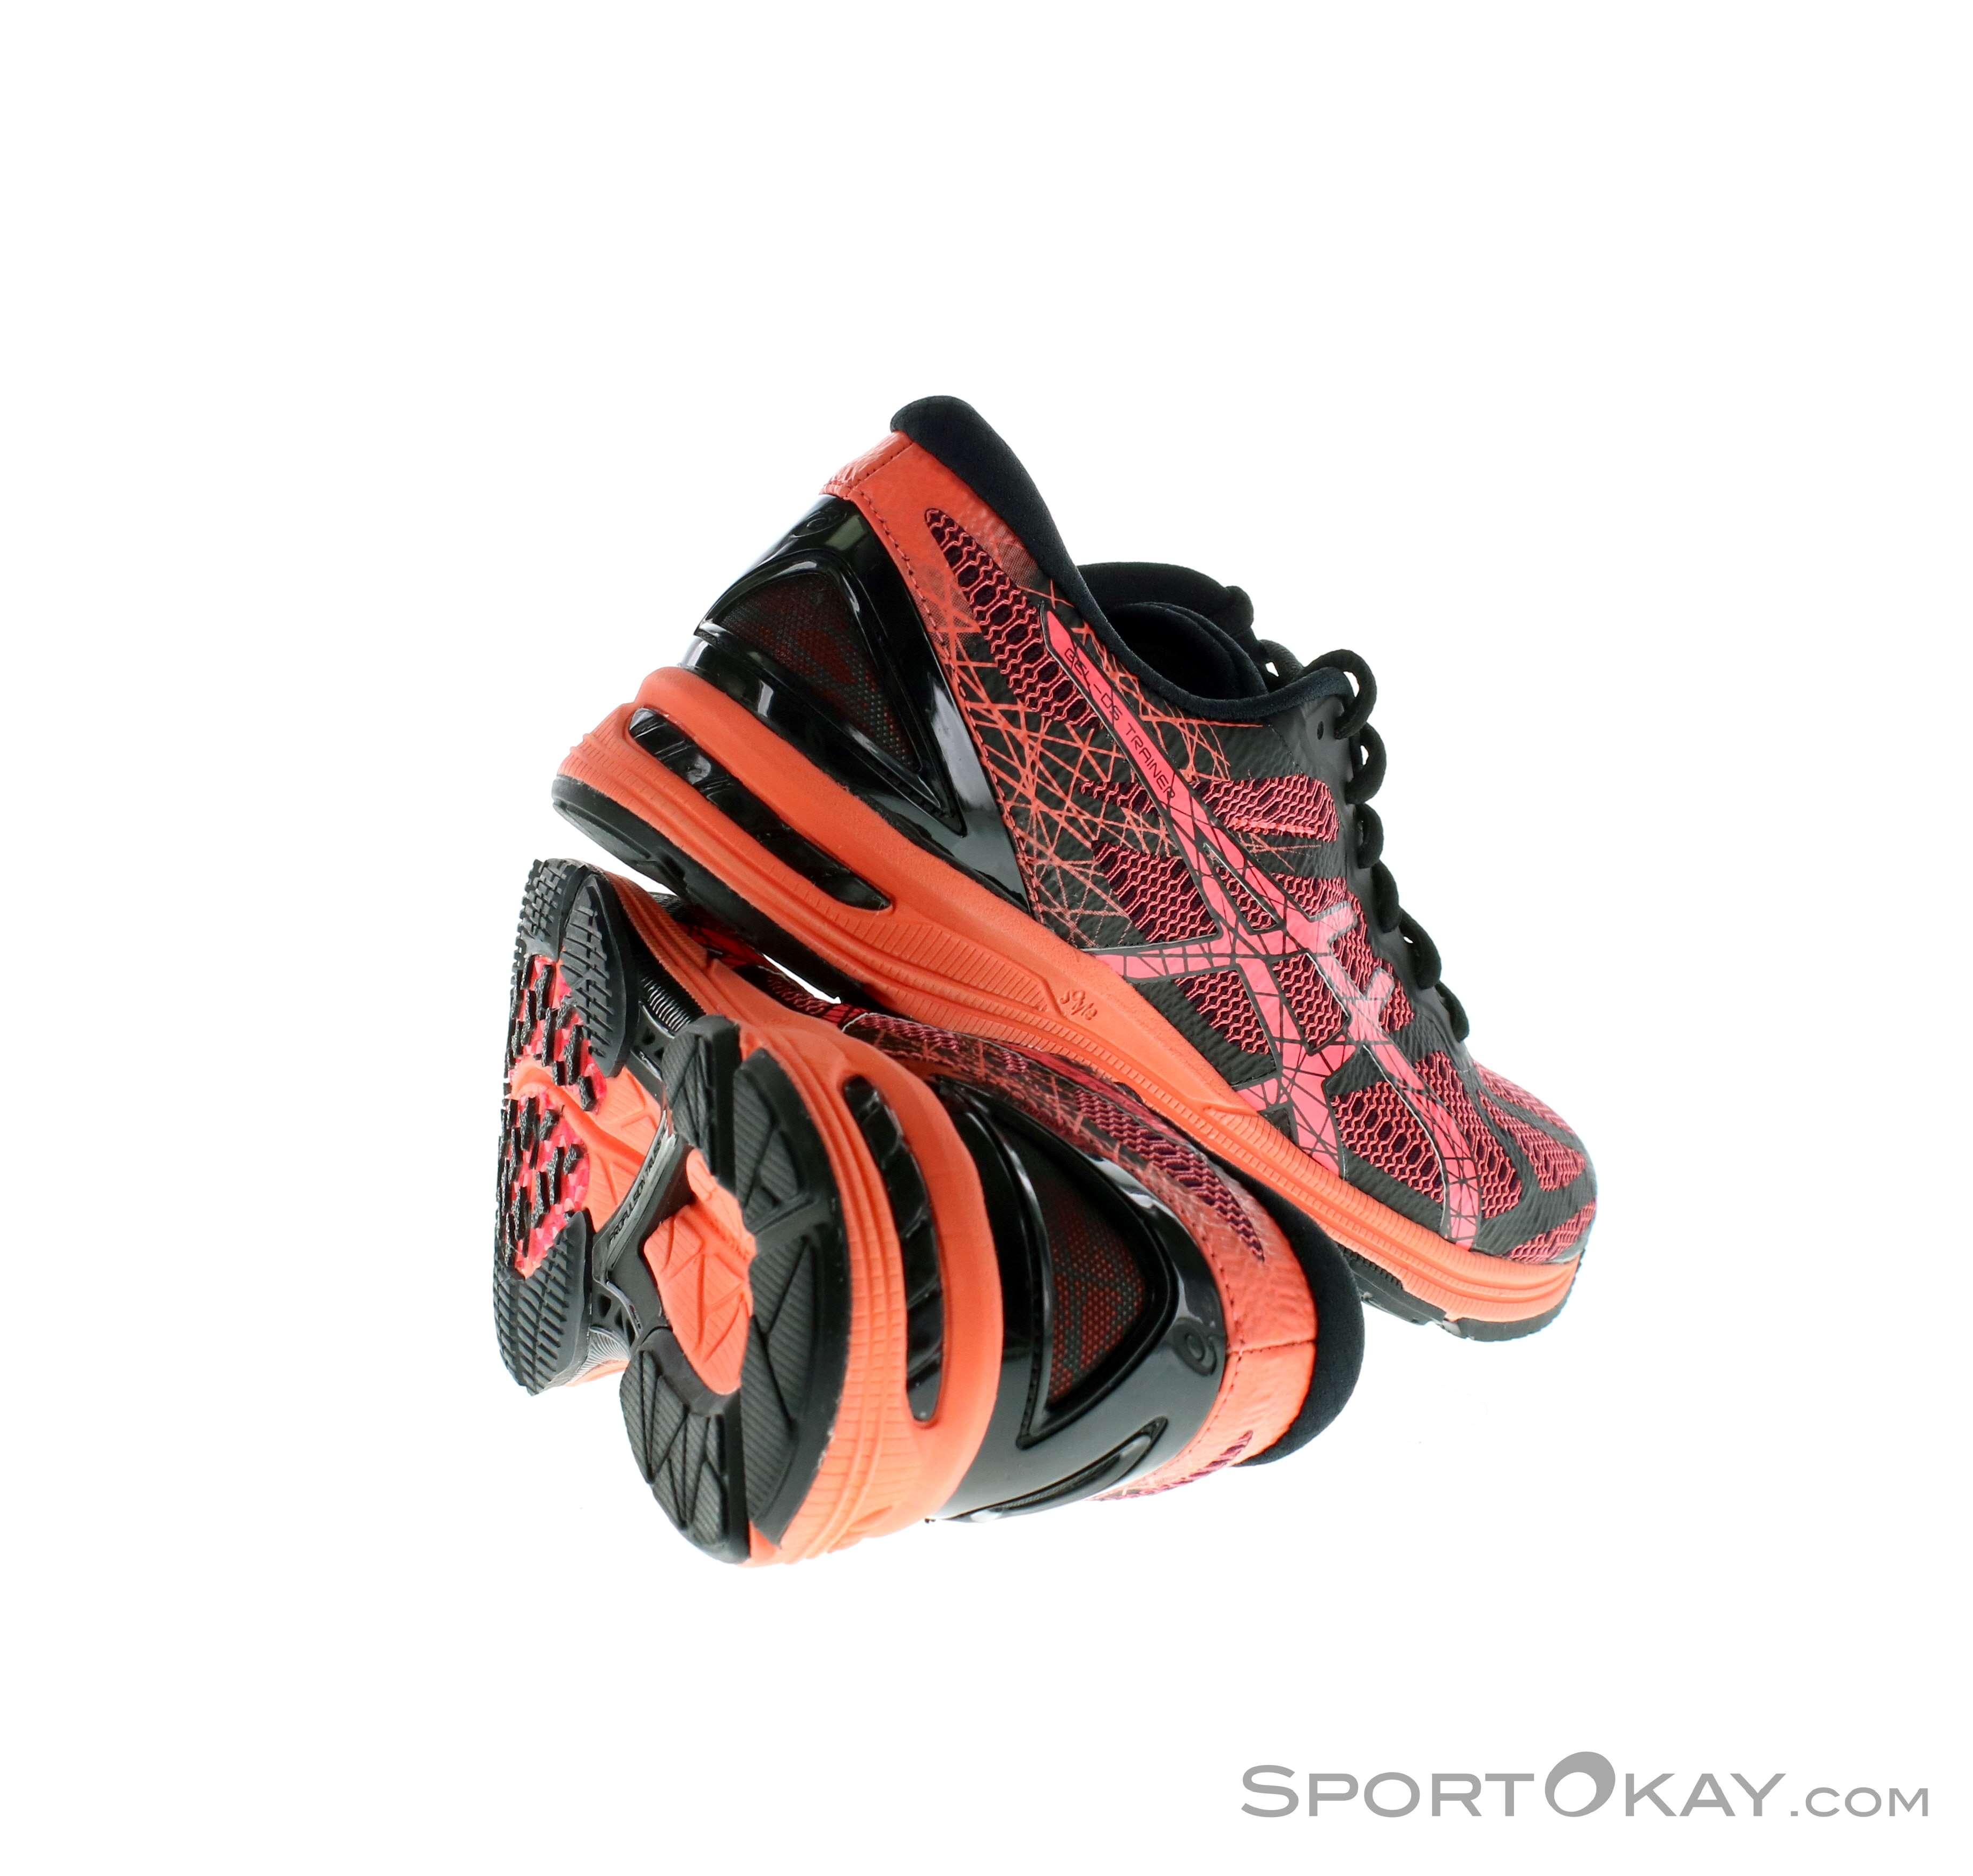 Asics Asics Gel DS Trainer 21 Womens Running Shoes